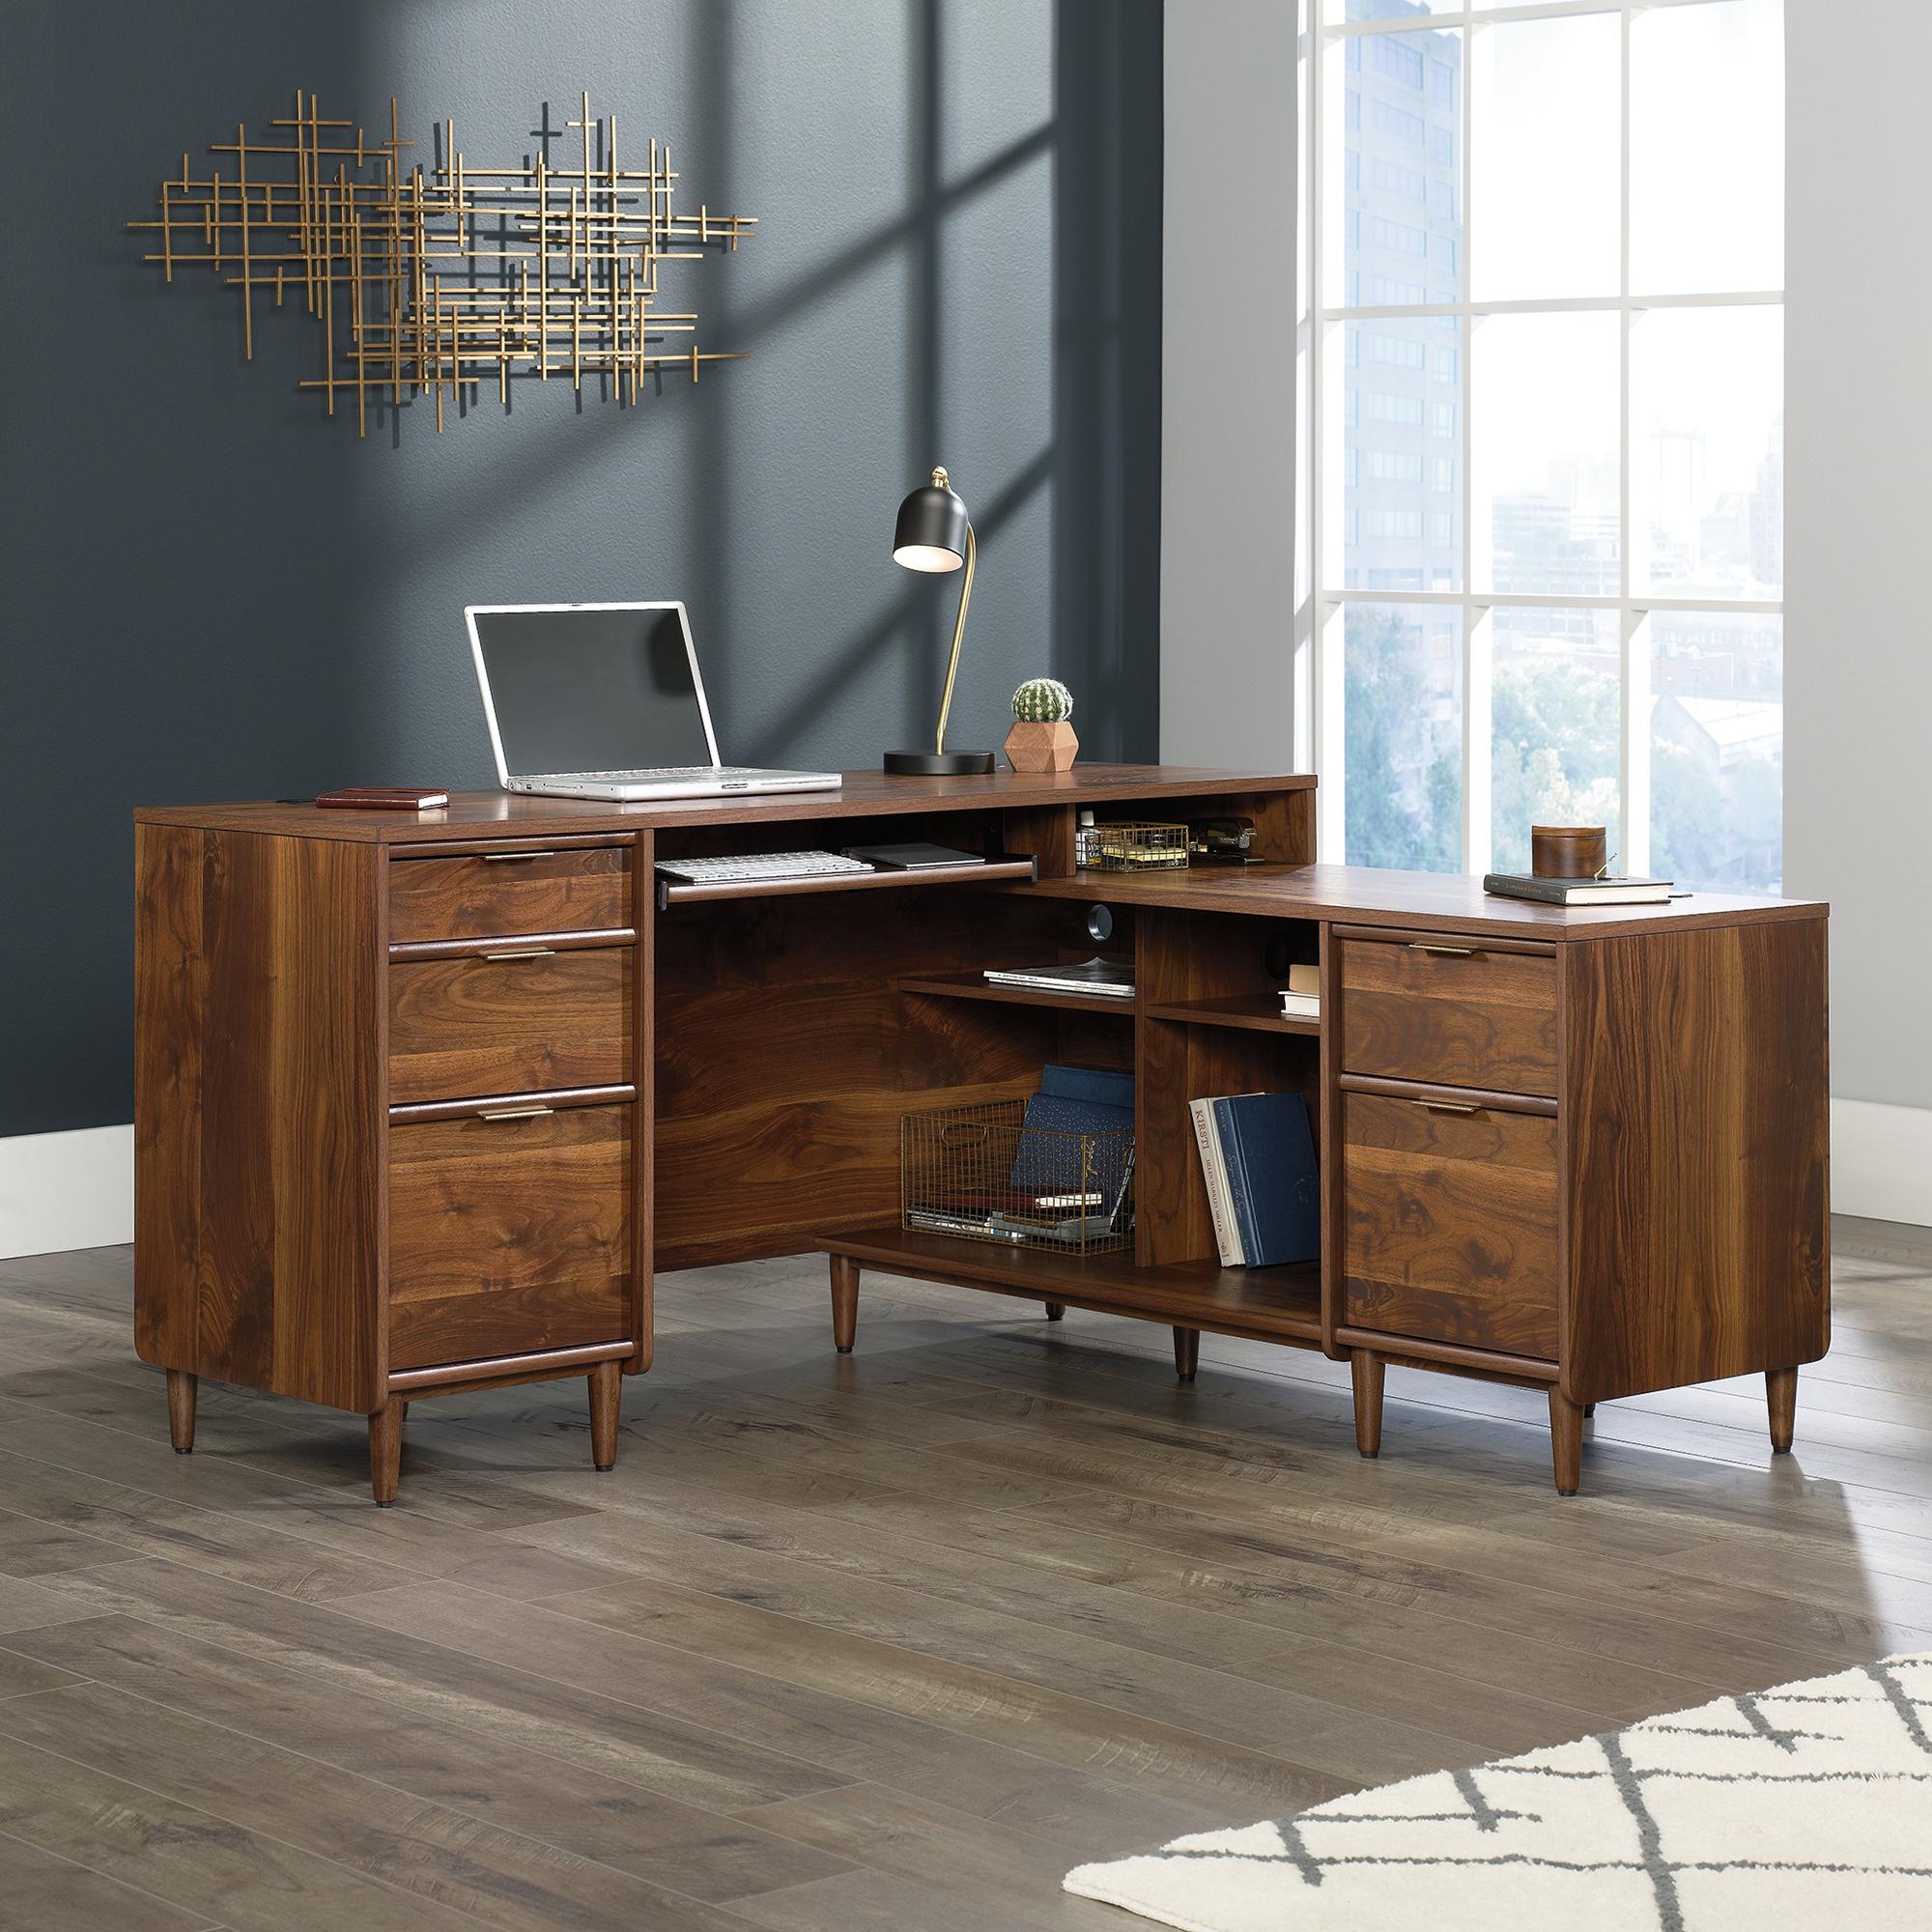 Teknik Office Clifton Place L-Shaped Executive Desk Grand Walnut effect finish Flip down keyboard shelf Cubby space Solid wooden feet